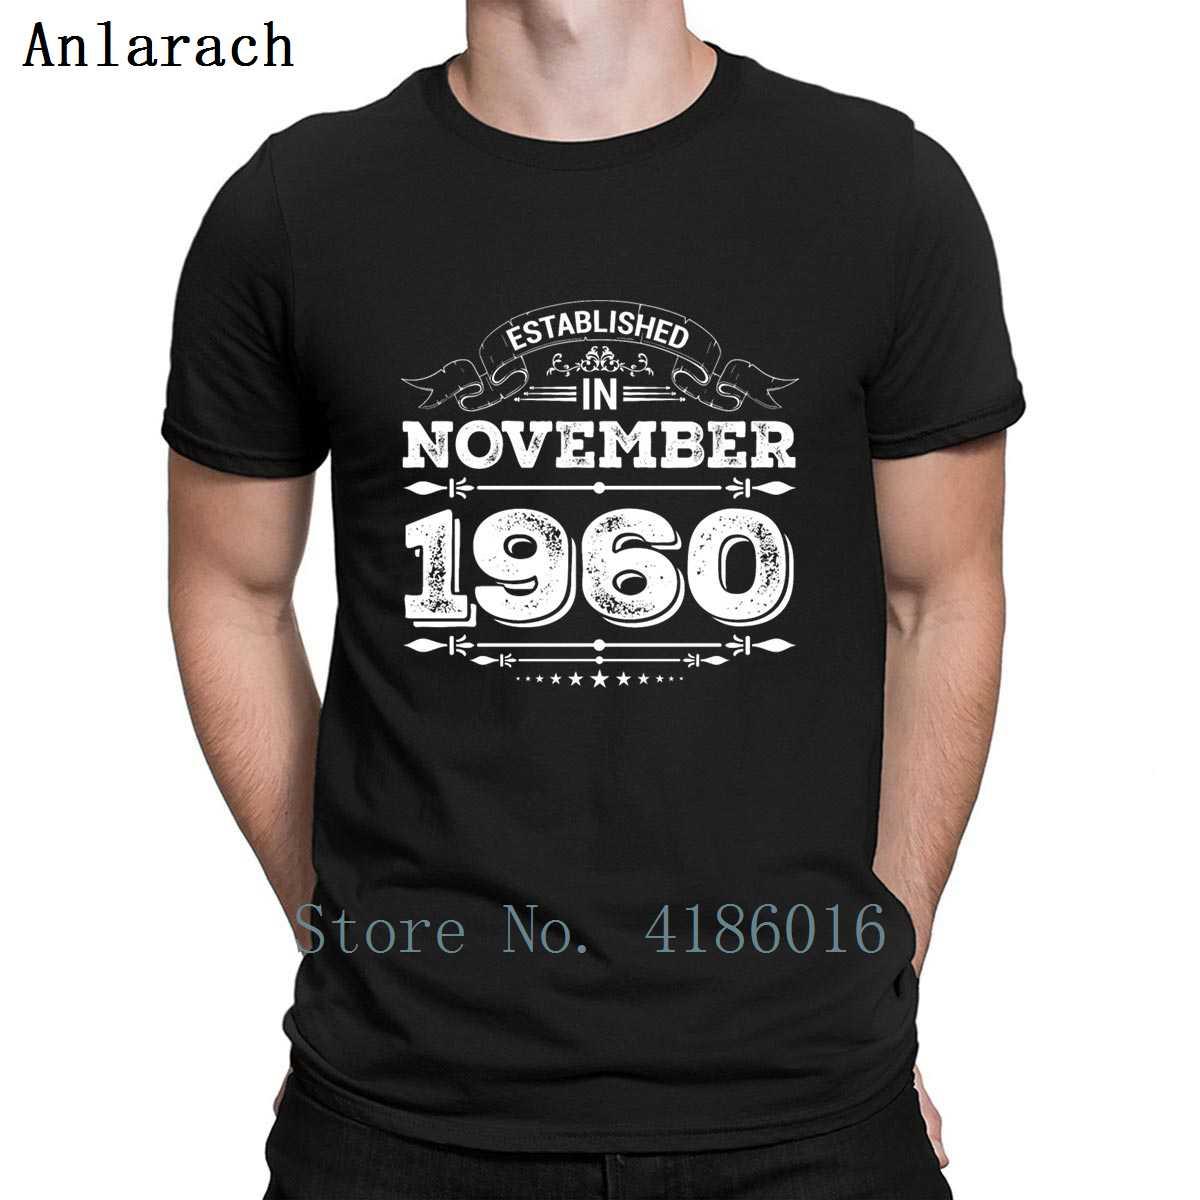 Established In November 1960 T Shirt Spring Autumn Homme Create Crew Neck Humor Loose Slim Cotton Shirt